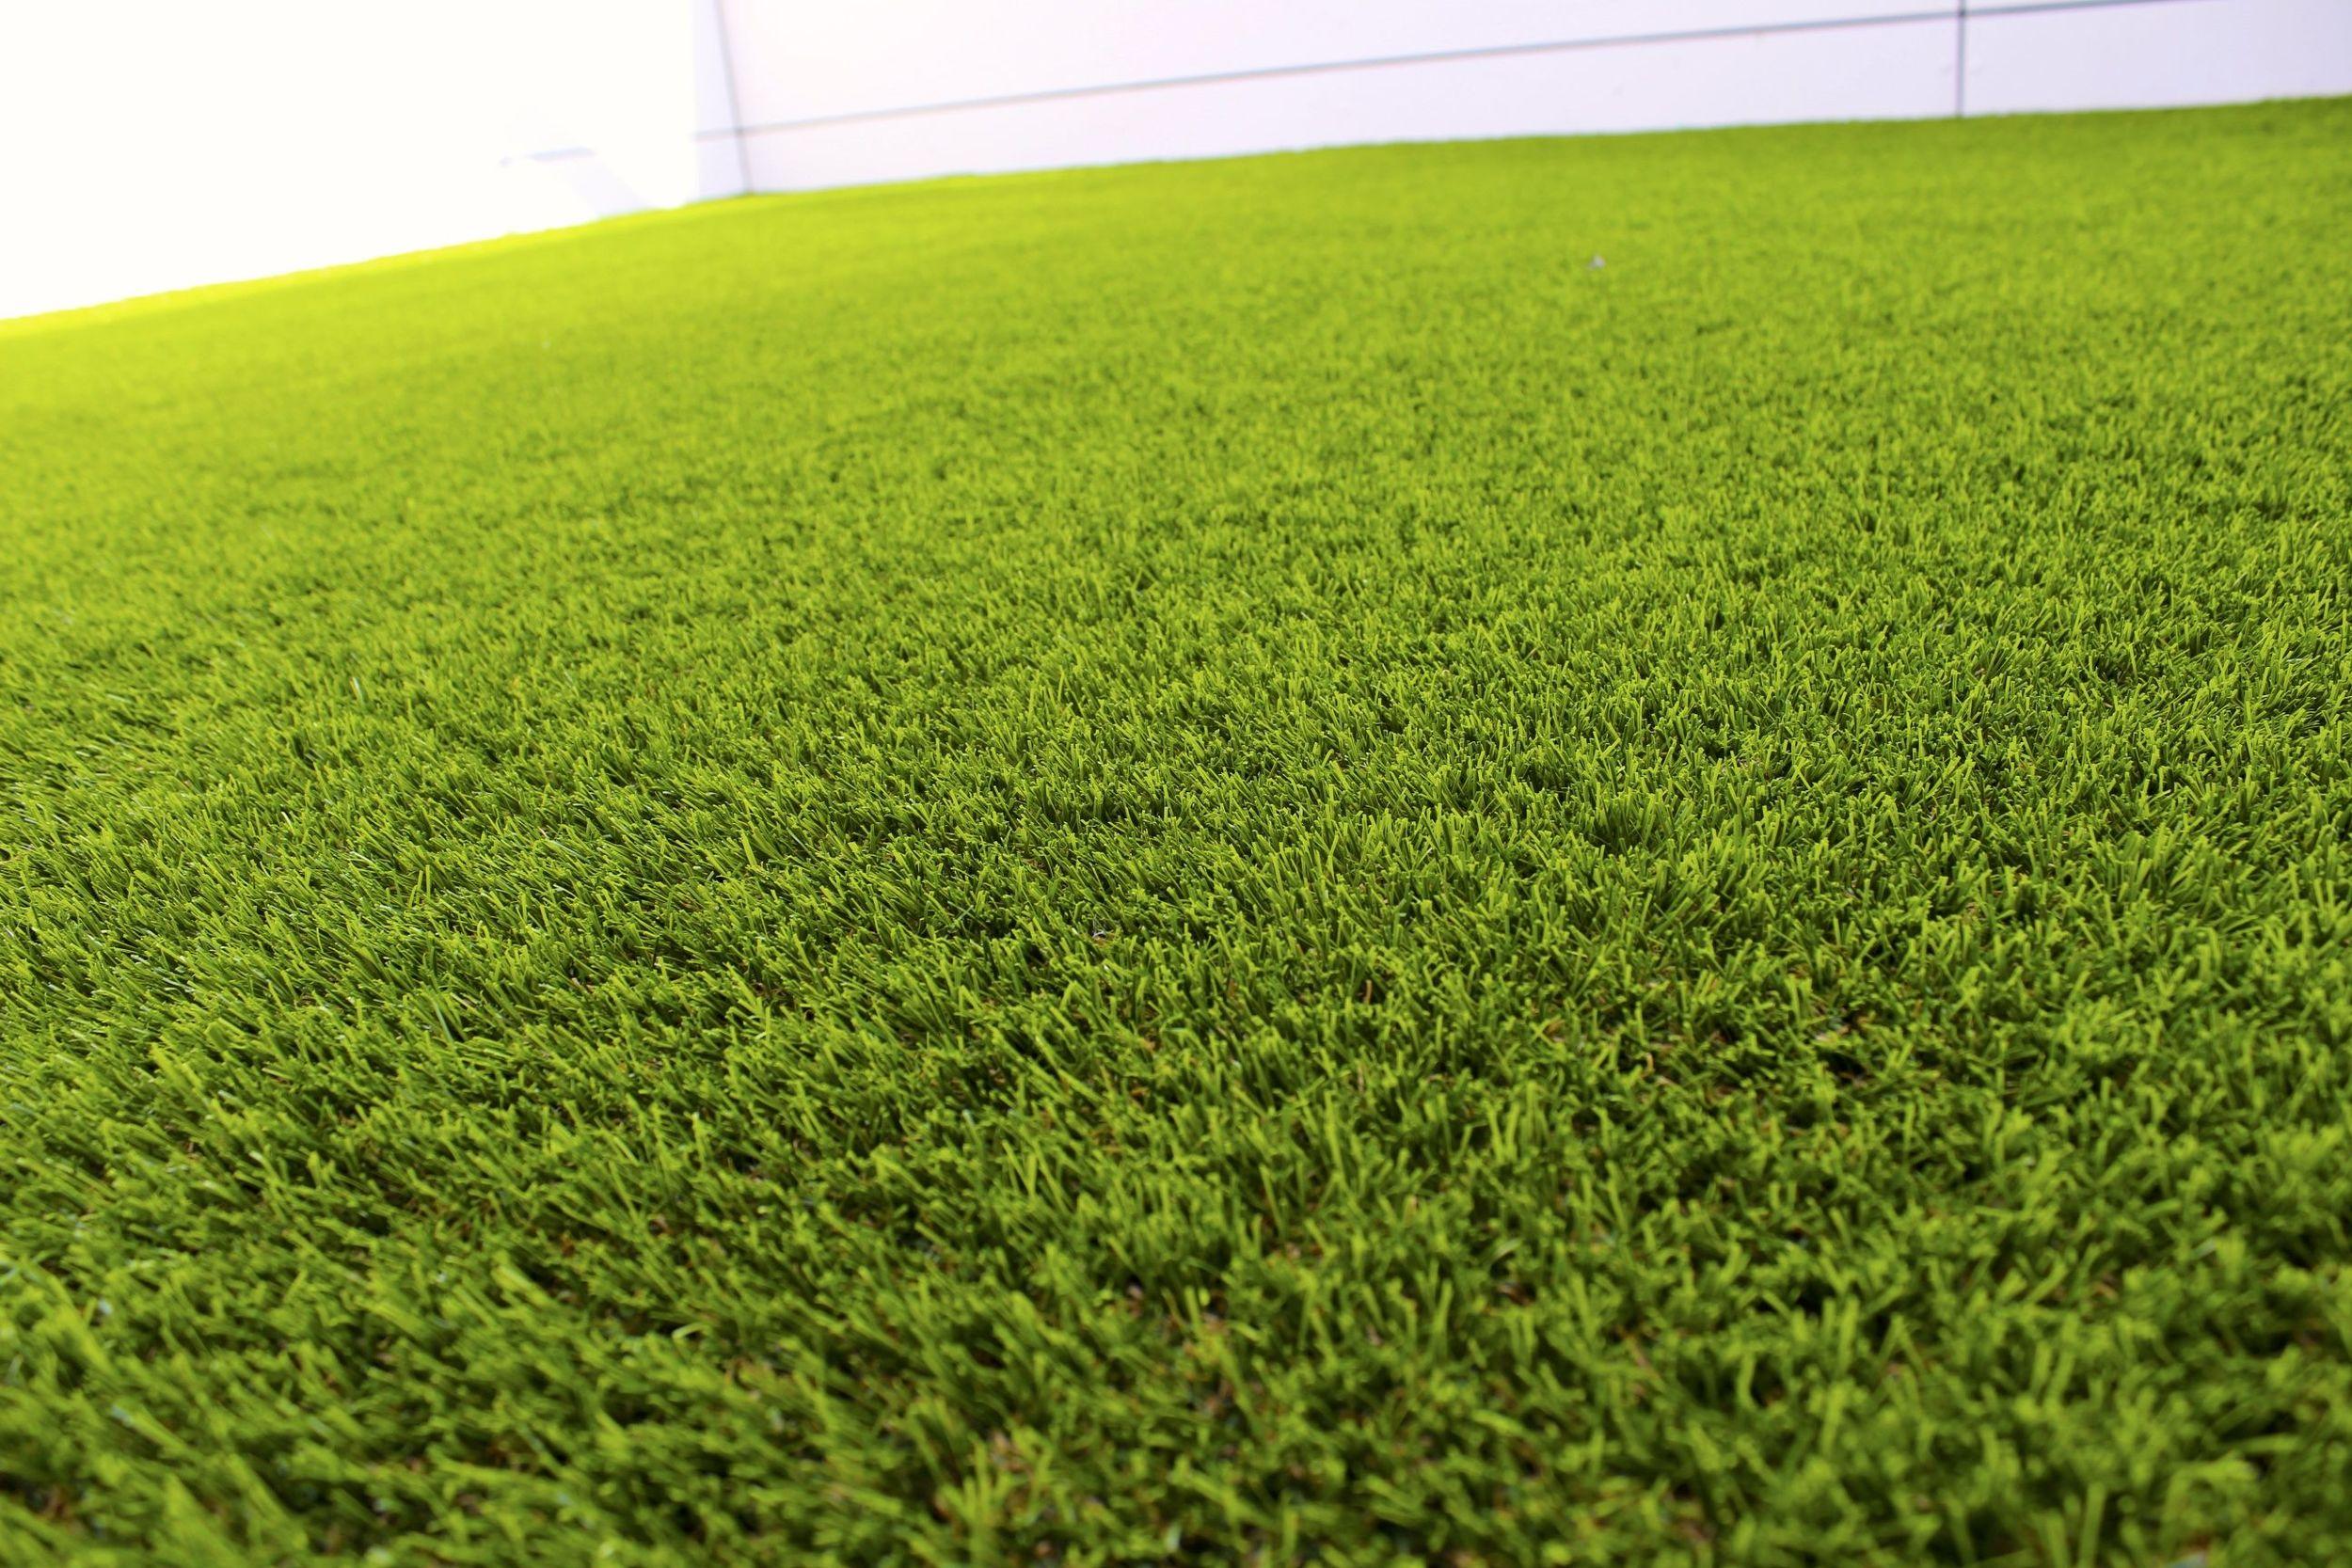 close up of turf